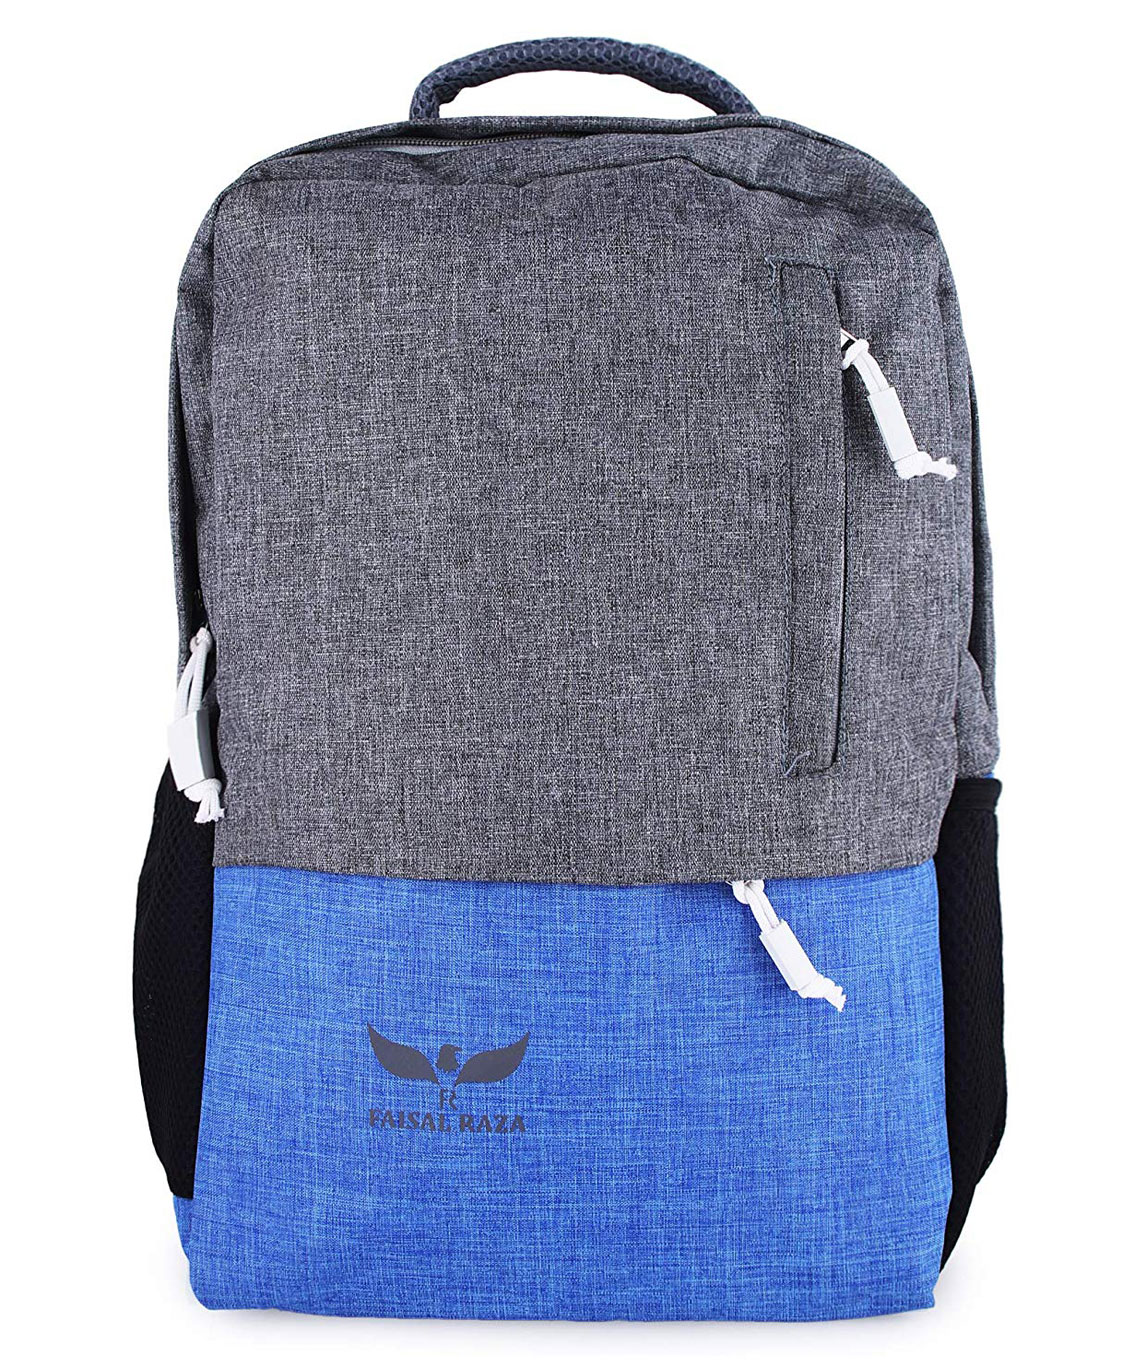 Frista30 Liters Casual Bagpack/School Bag/Laptop Backpack(Grey::Blue)